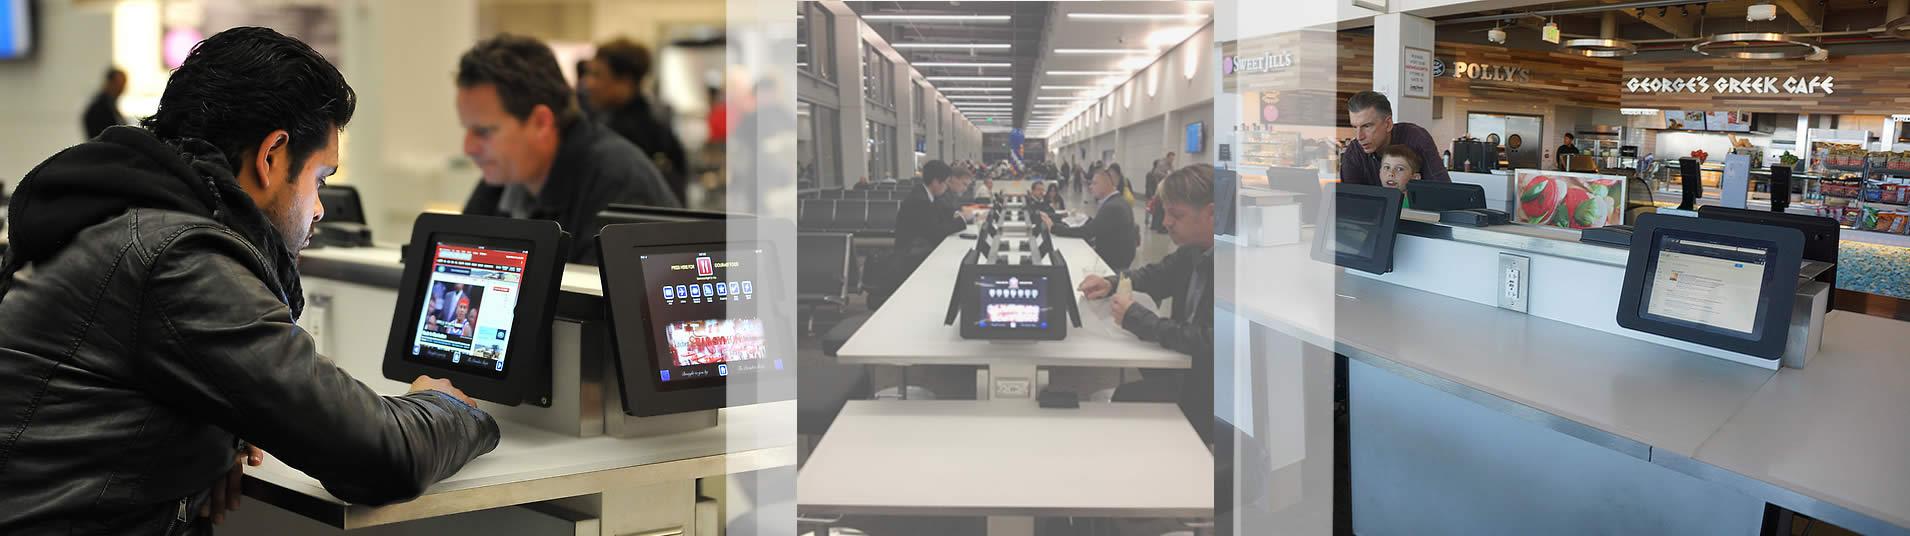 ipad-standaard-wandhouders-luchthaven